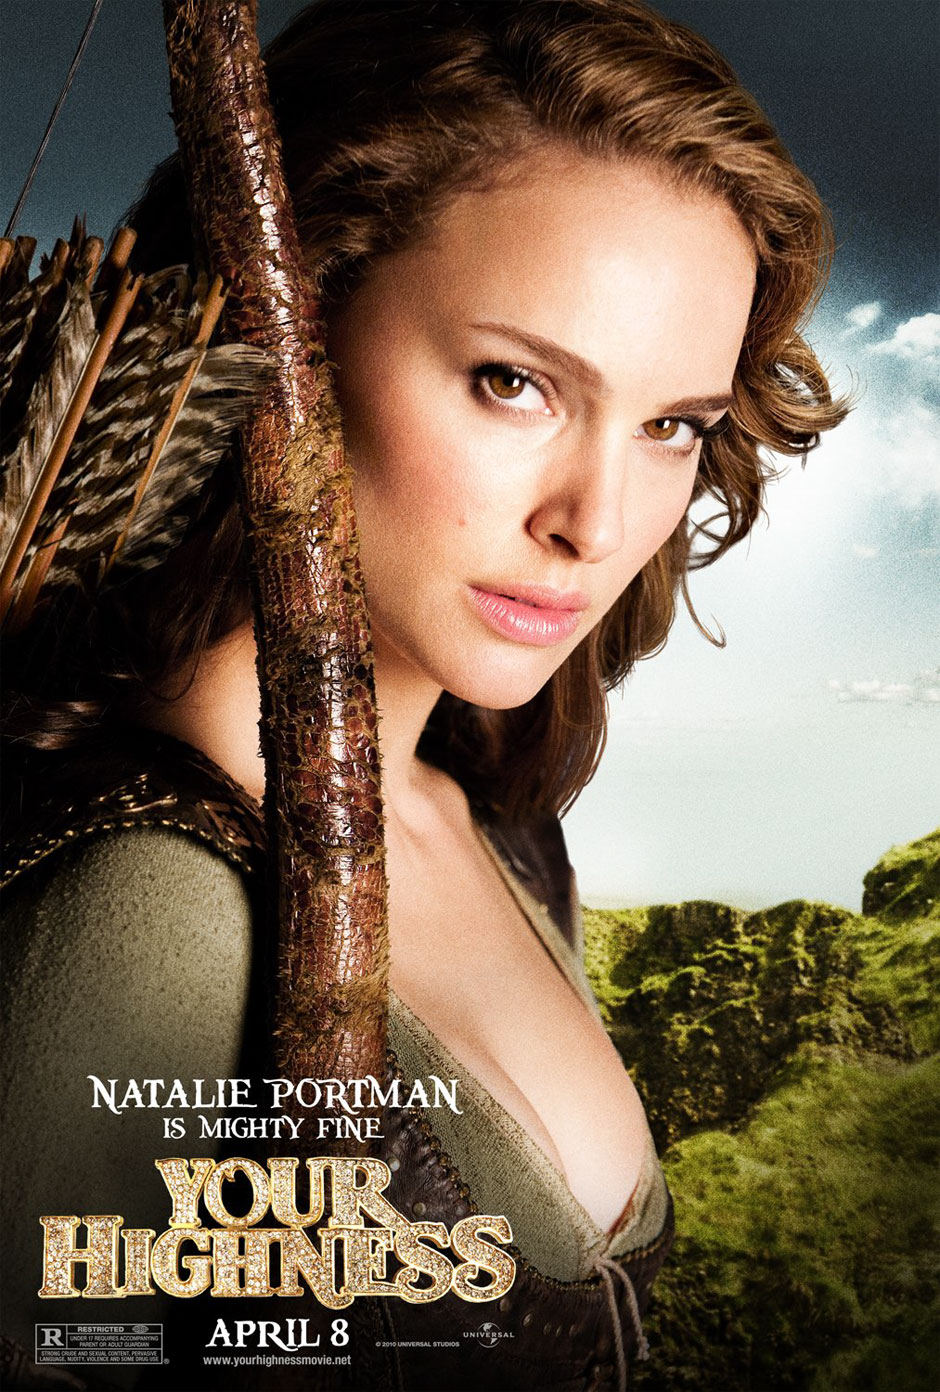 HYDRA - Kaijumatic Natalie Portman